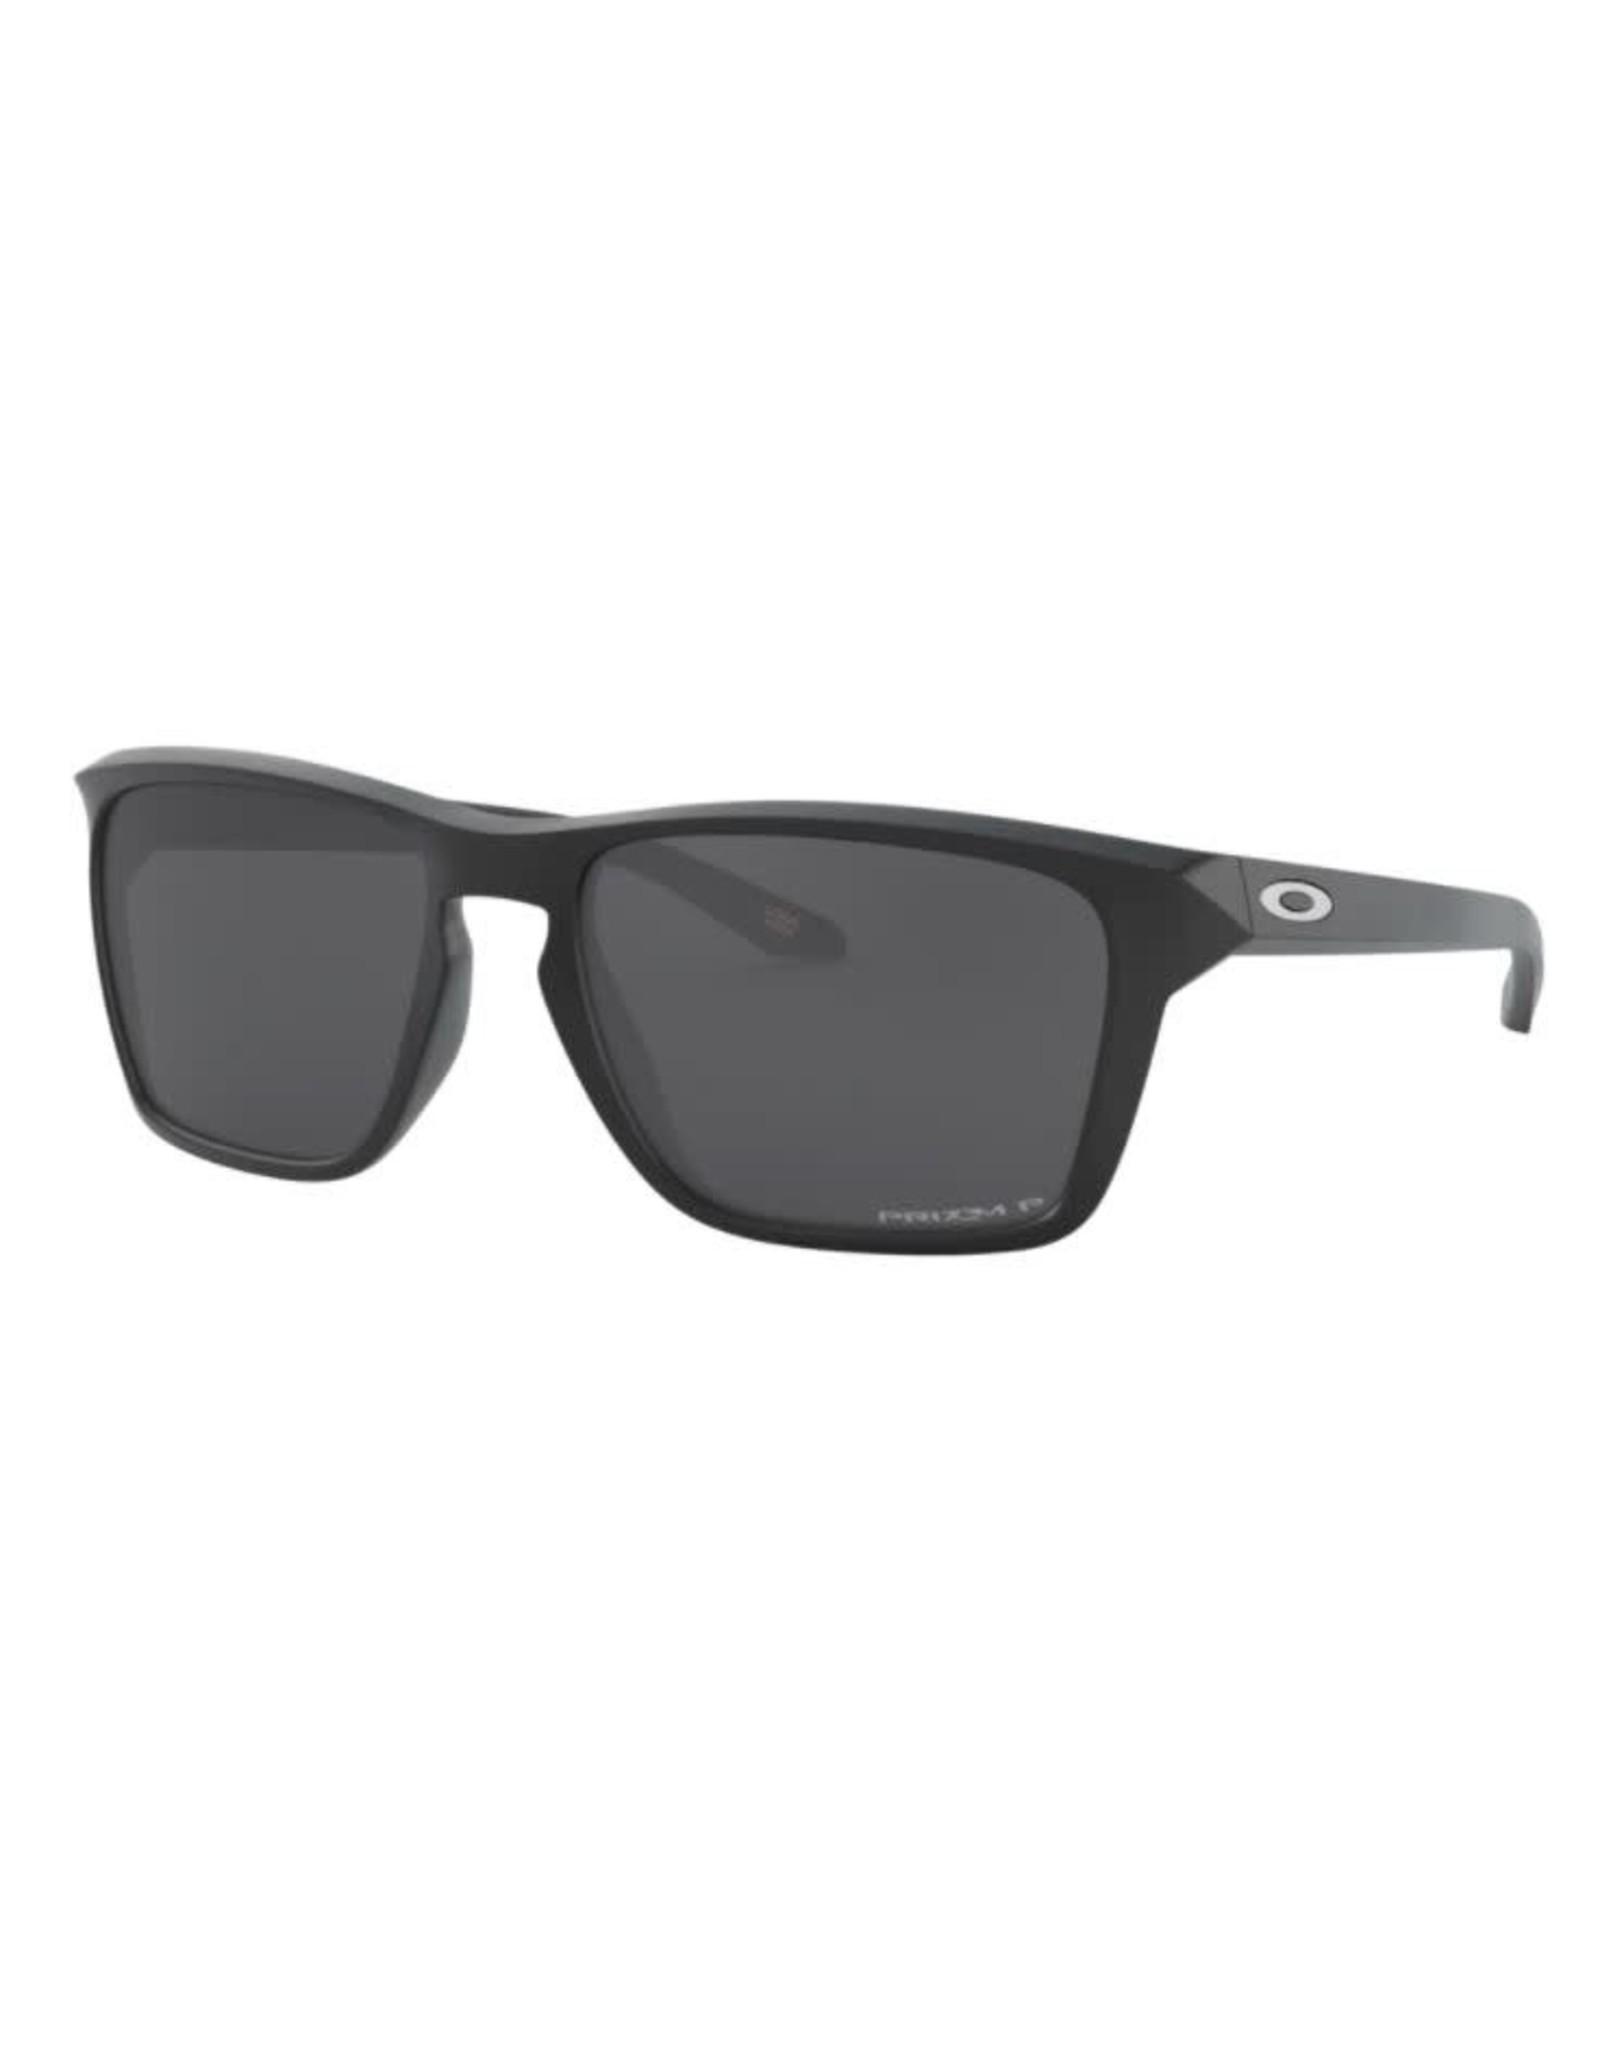 Oakley Oakley - Lunette soleil homme sylas matte black/lens prizm black polarized